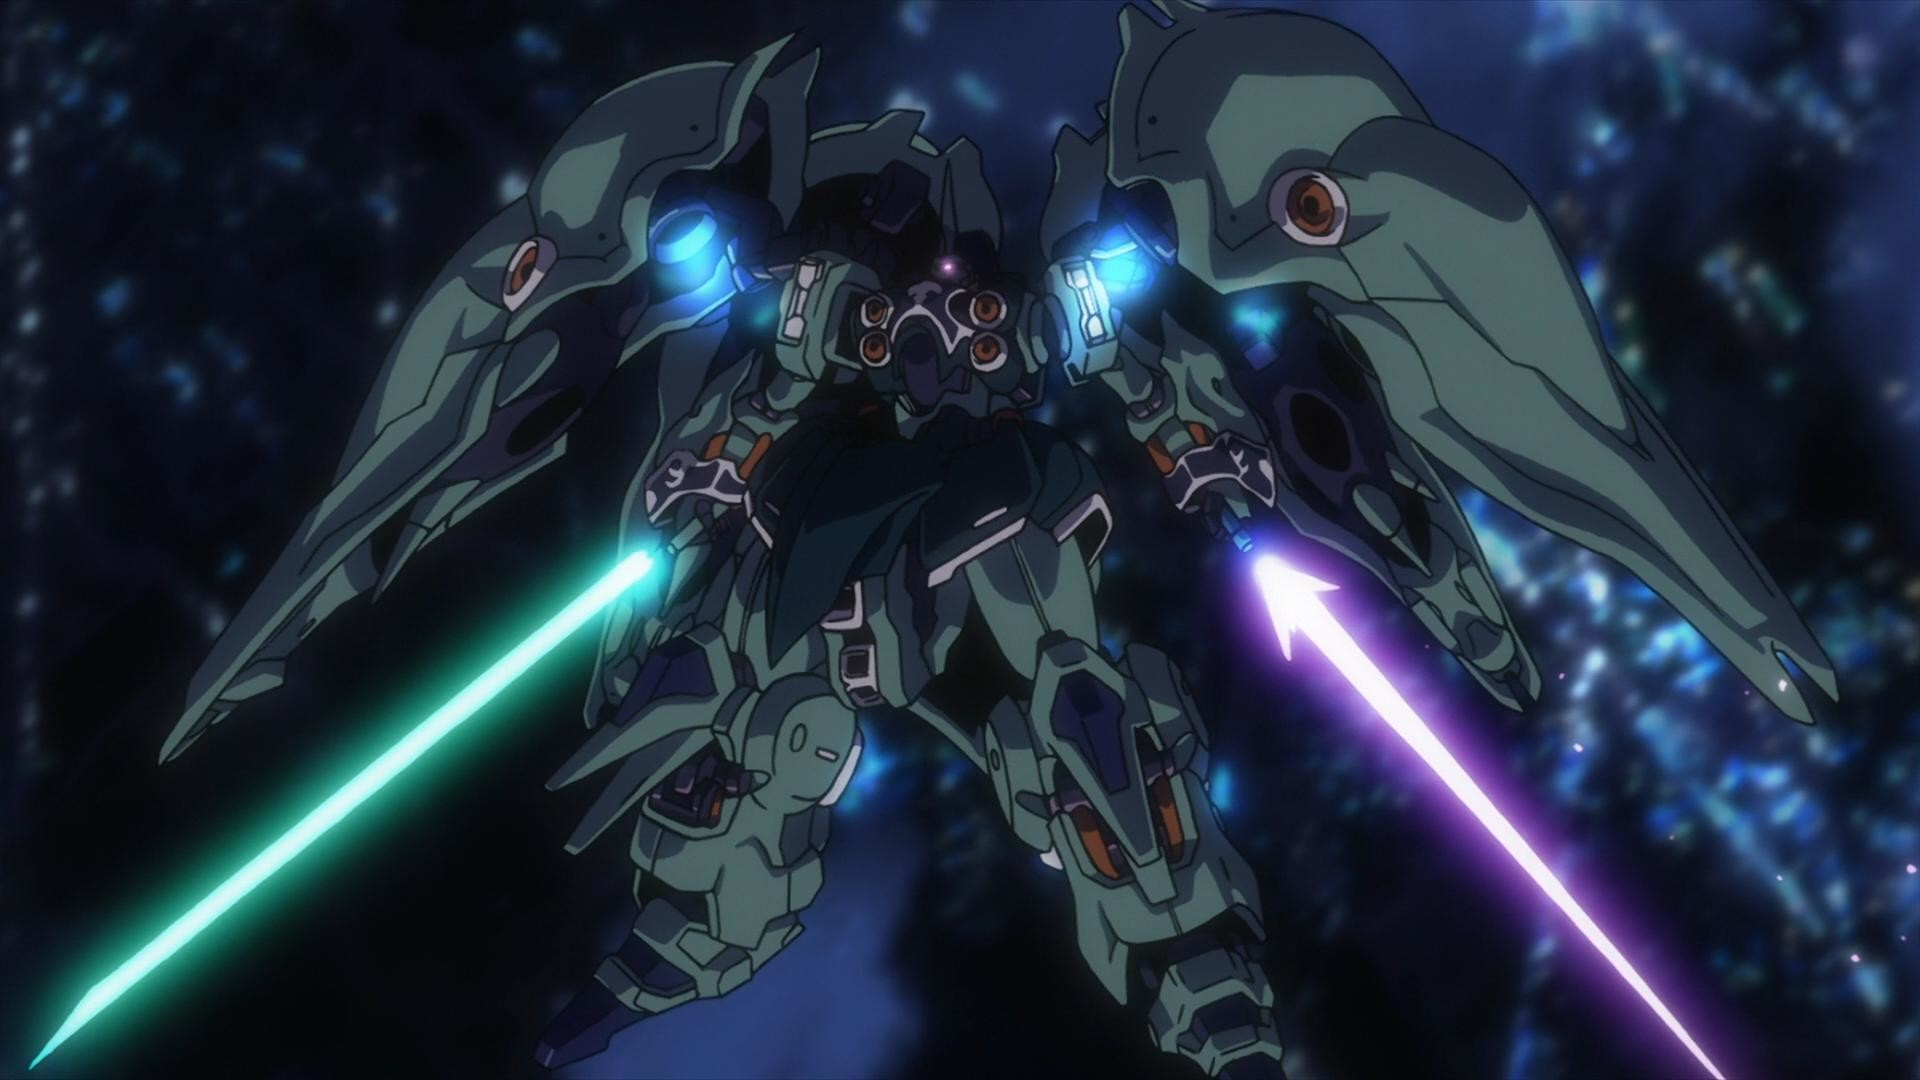 Robotech Free Gundam Wing Hd Wallpaper – 1531661